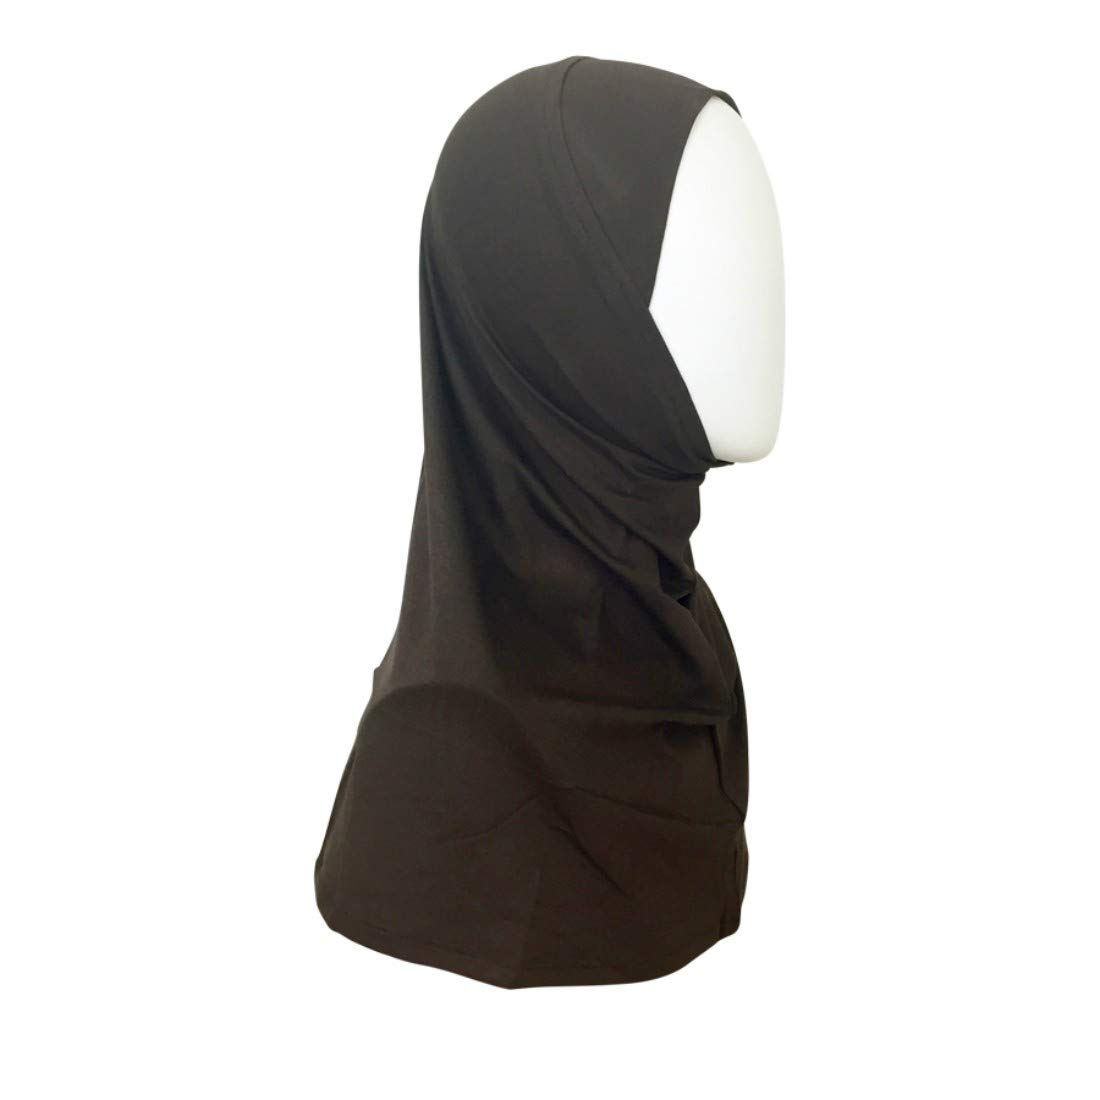 One Piece Amira Hijab Regular Size Slip-on Viscose Lycra